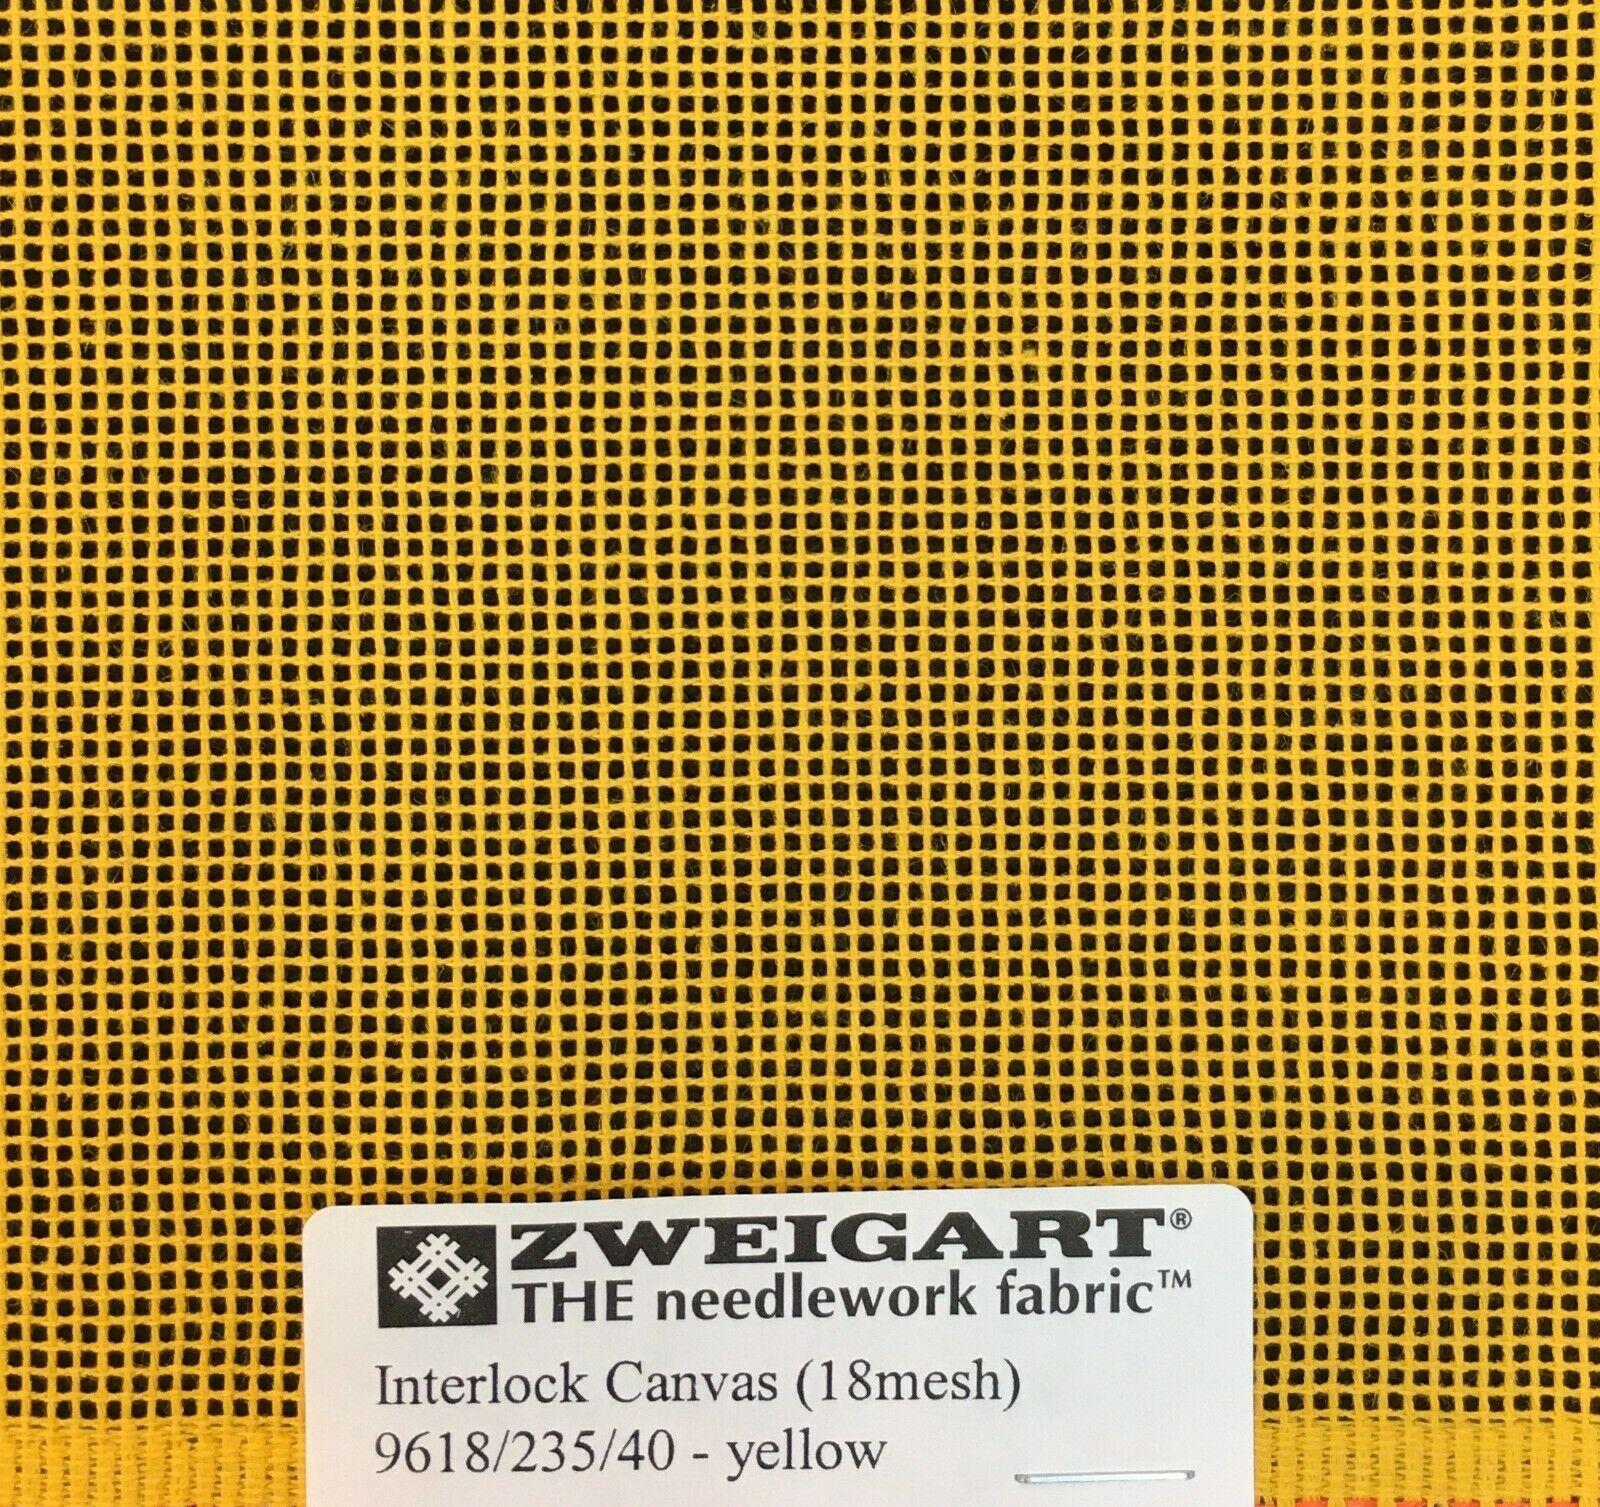 Interlock Needlepoint Canvas 18 Count Dark Yellow   Custom Cuts   Blank Canvas  - $7.13 - $28.40